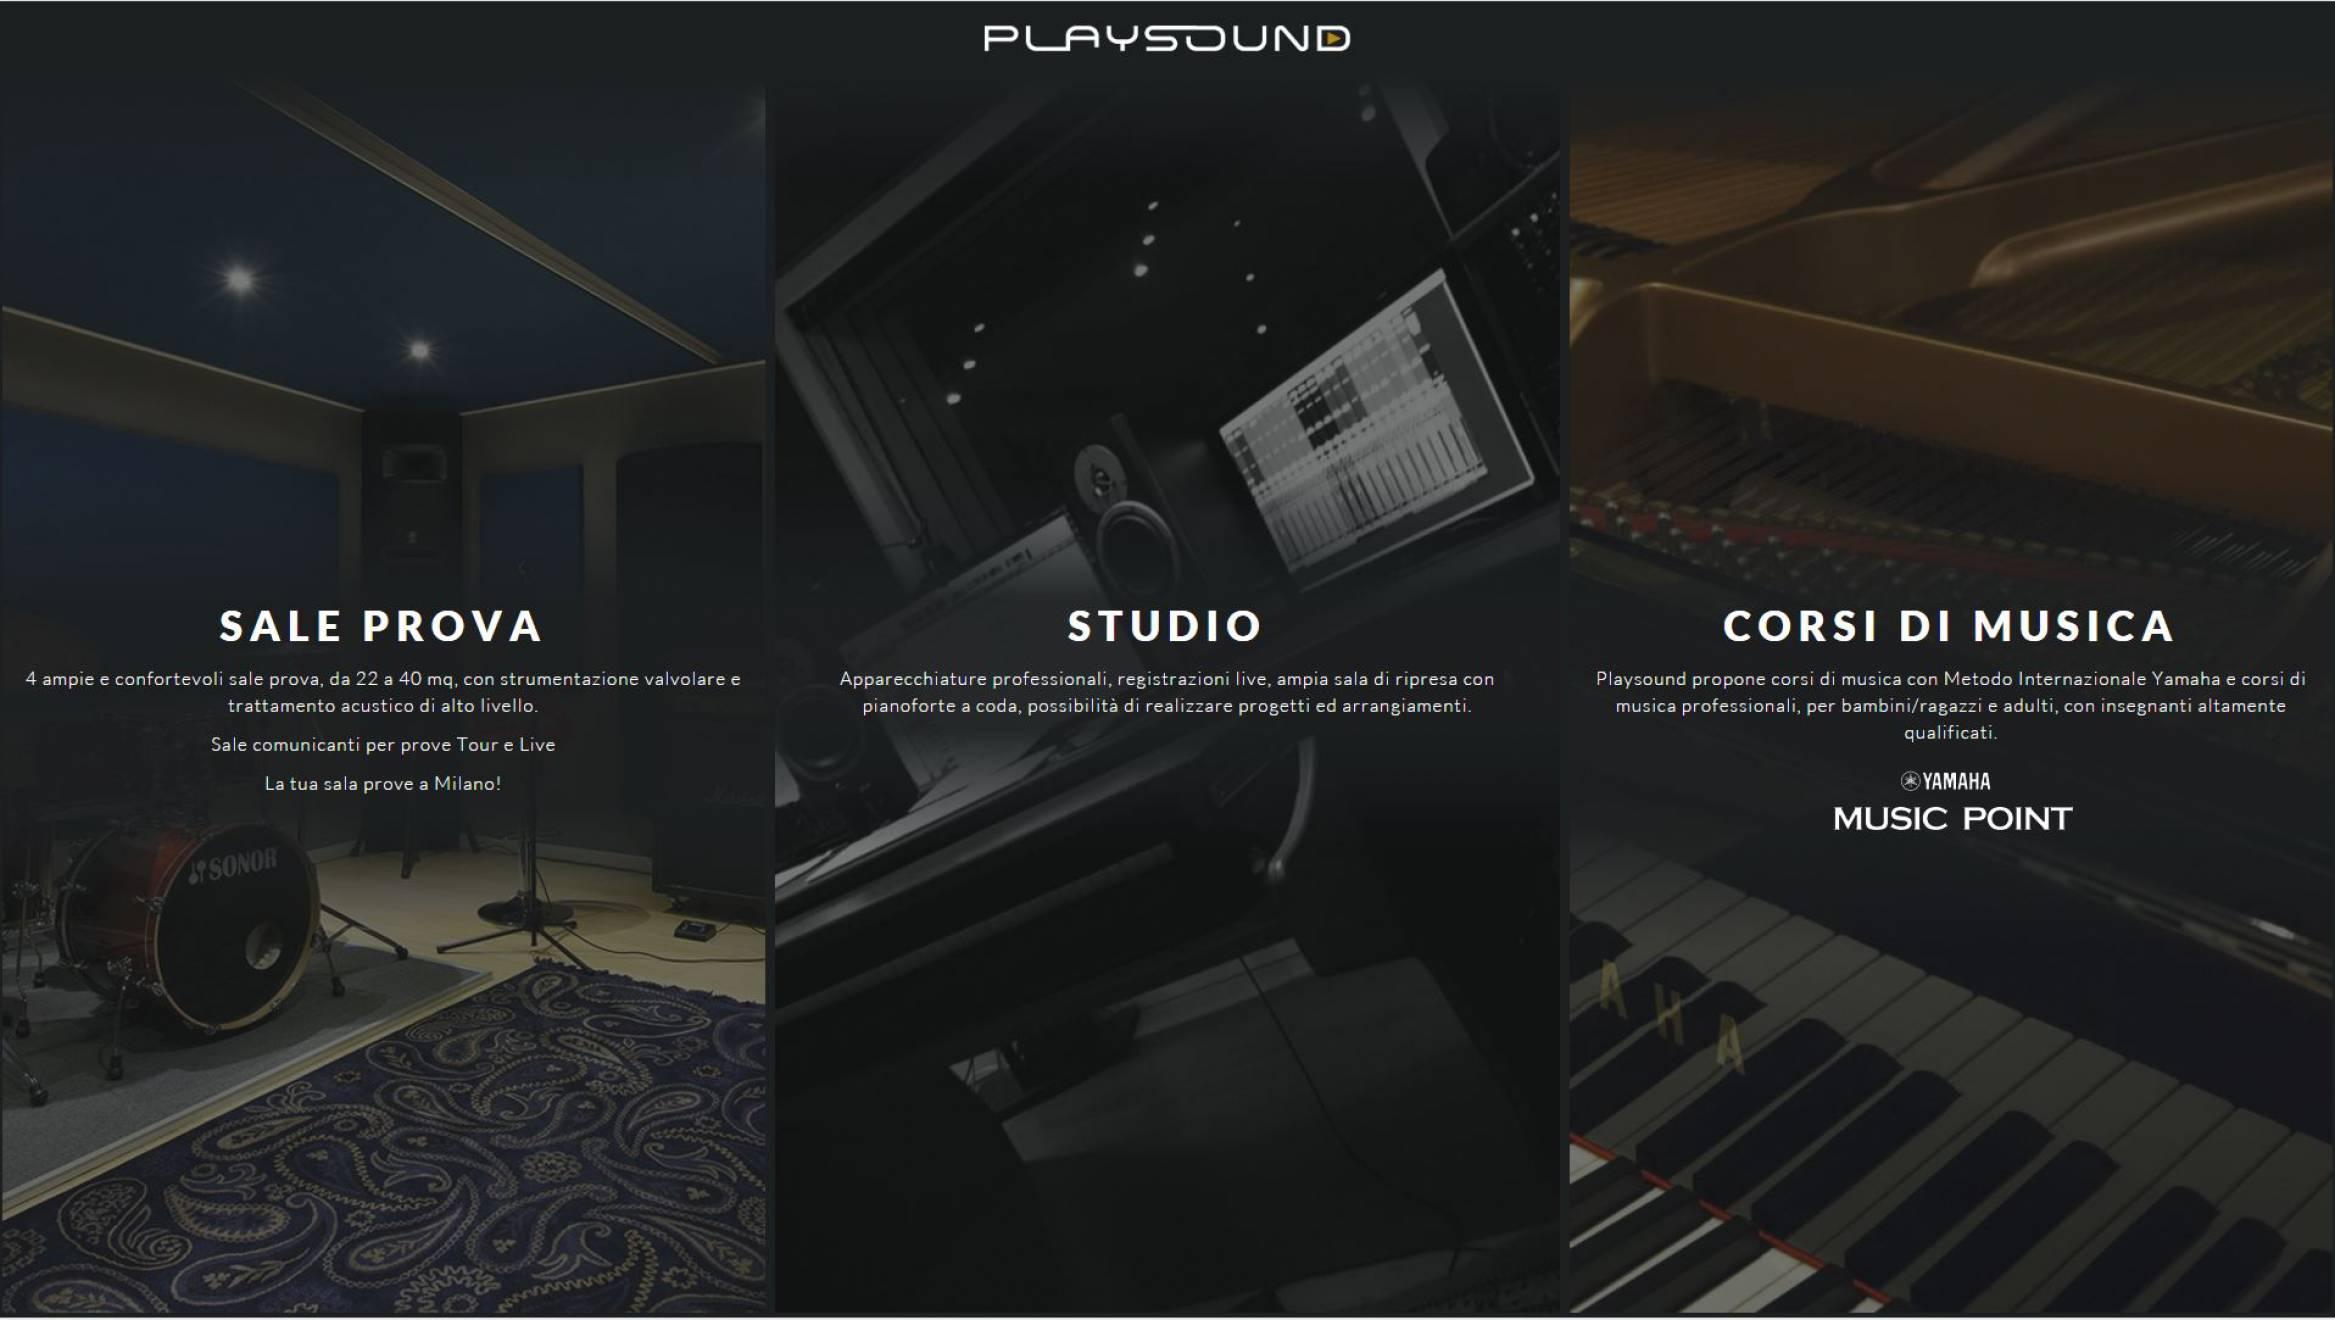 Introduzione sito web Playsound